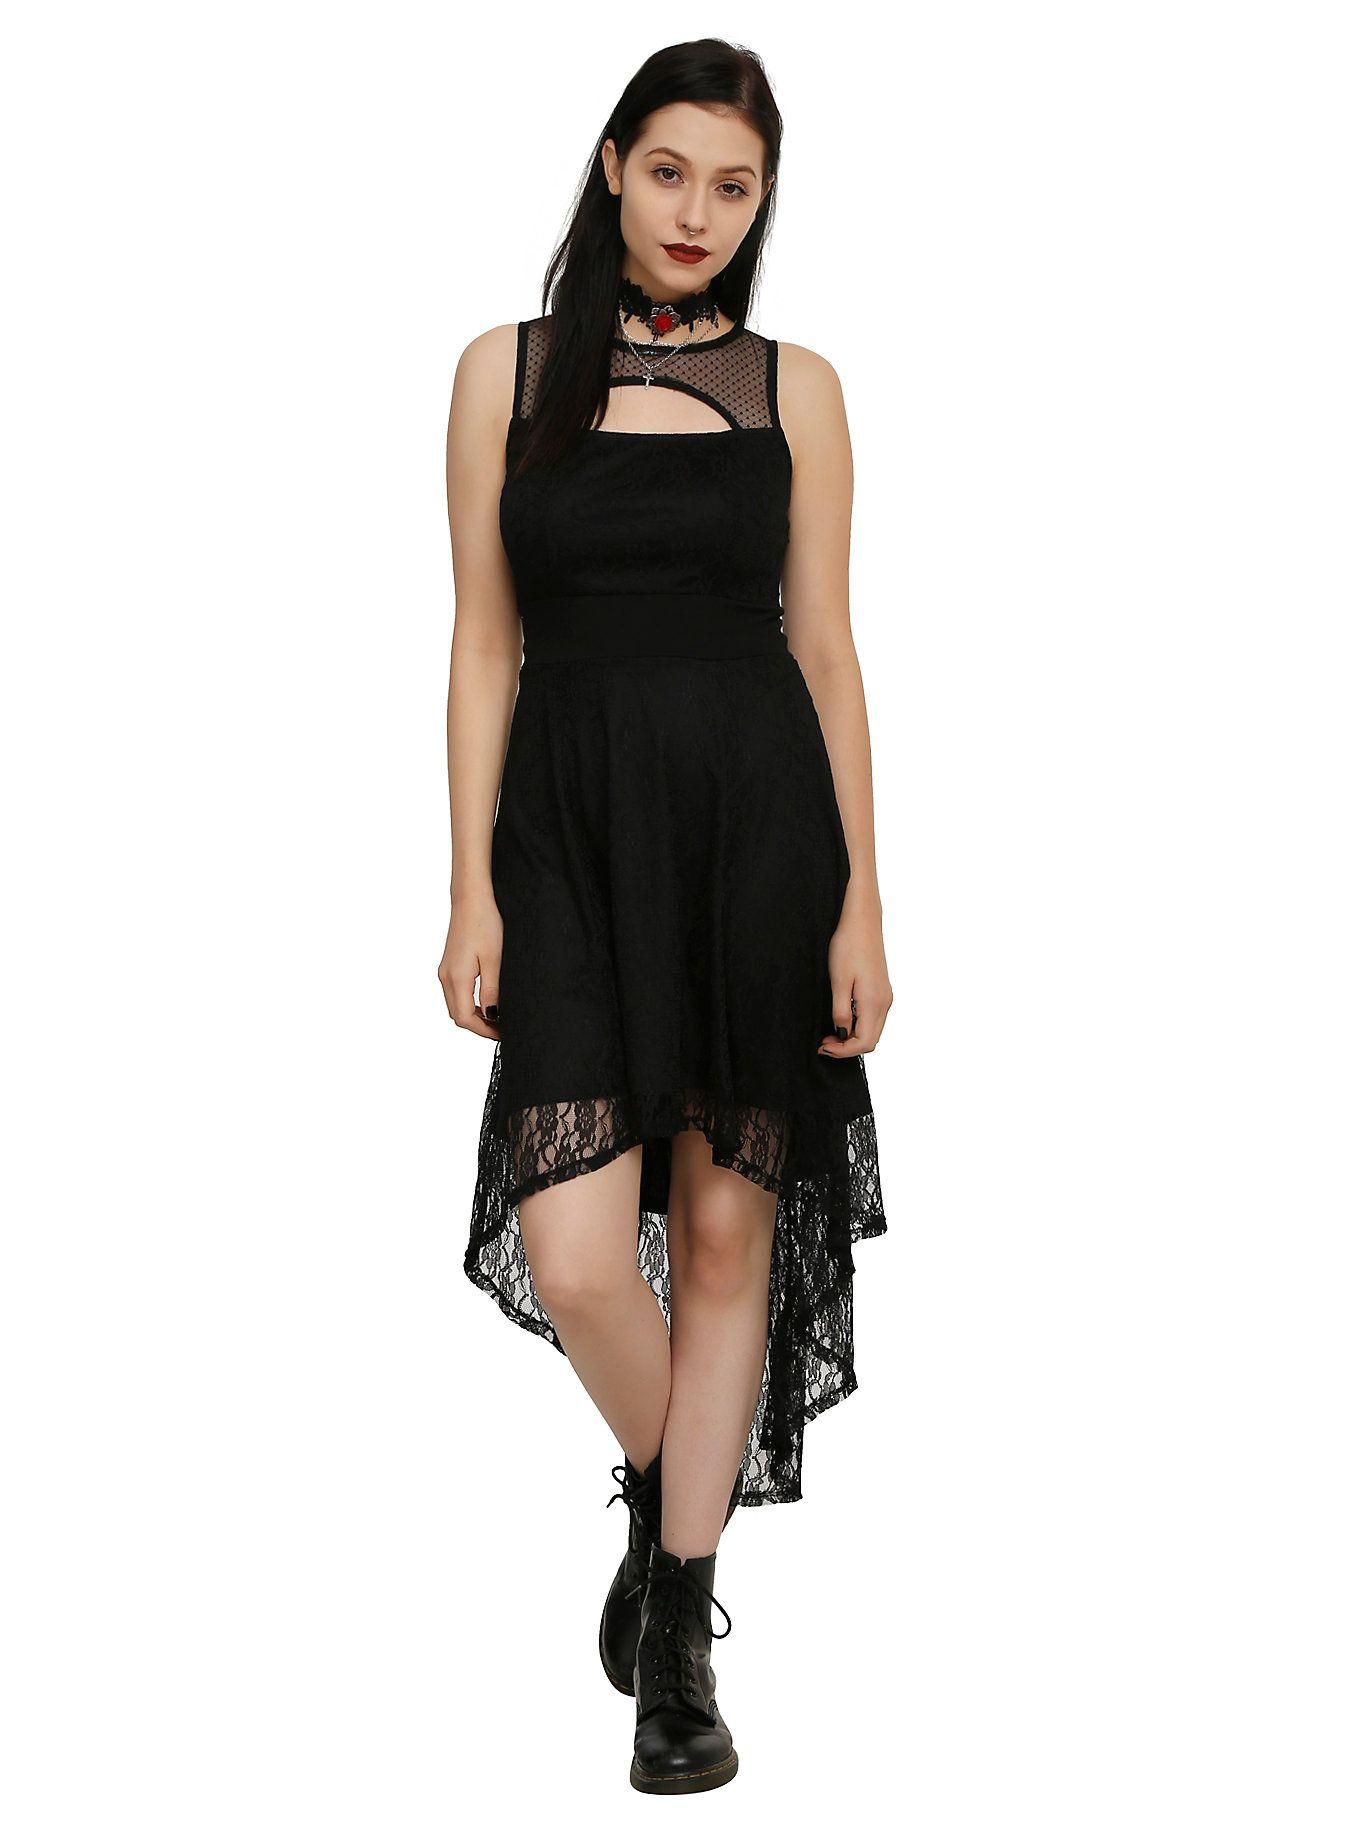 Royal Bones By Tripp Black Lace Hi-Lo Dress  e72ce09b6